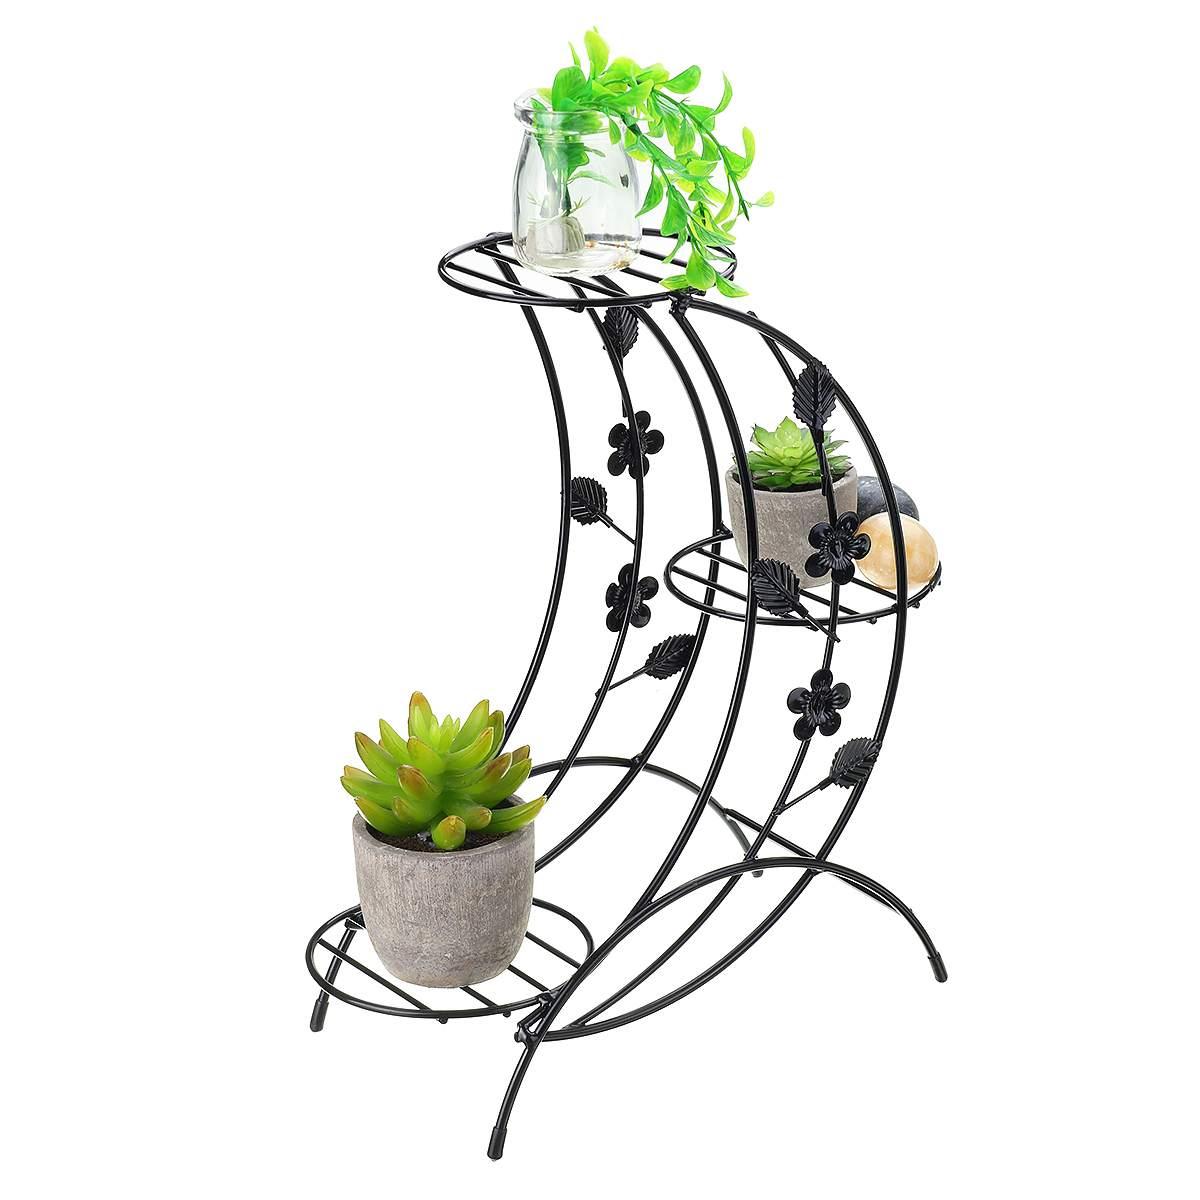 Multi-layer Plant Stand Succulent Shelf Household Wrought Iron Rack Balcony Simple Indoor Coffee Bar Garden Flower Pot Shelf